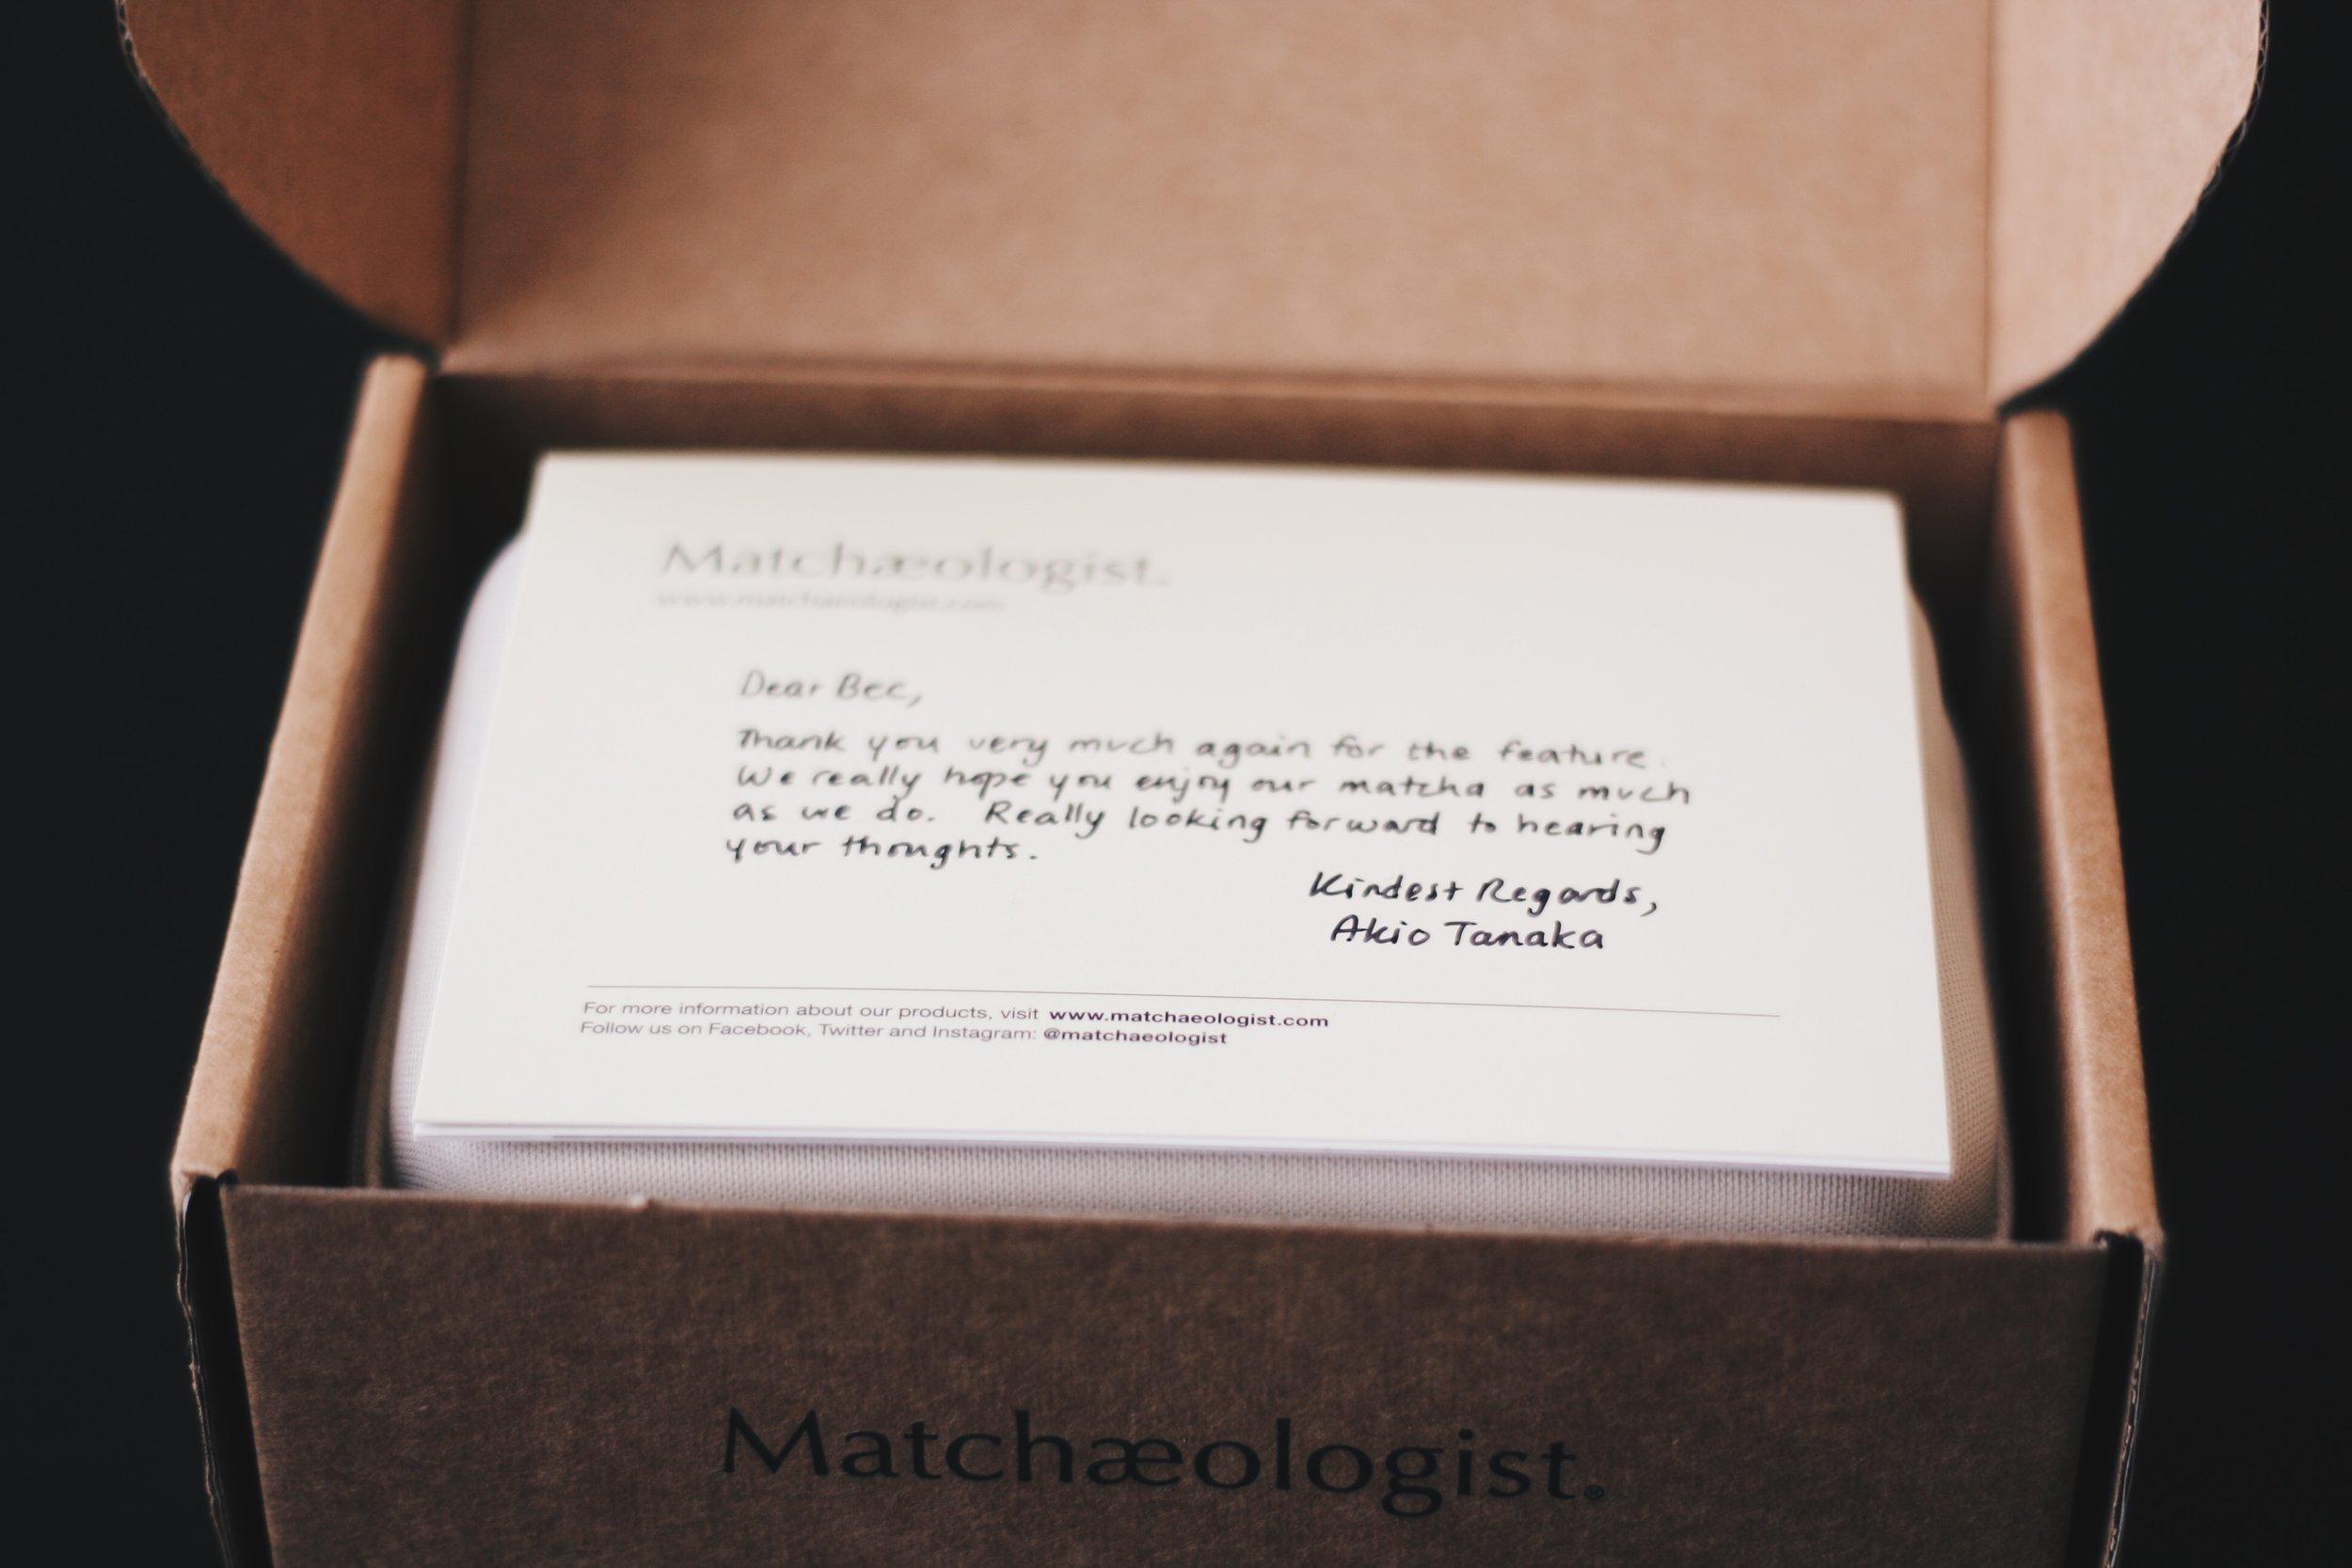 Matchaeologist